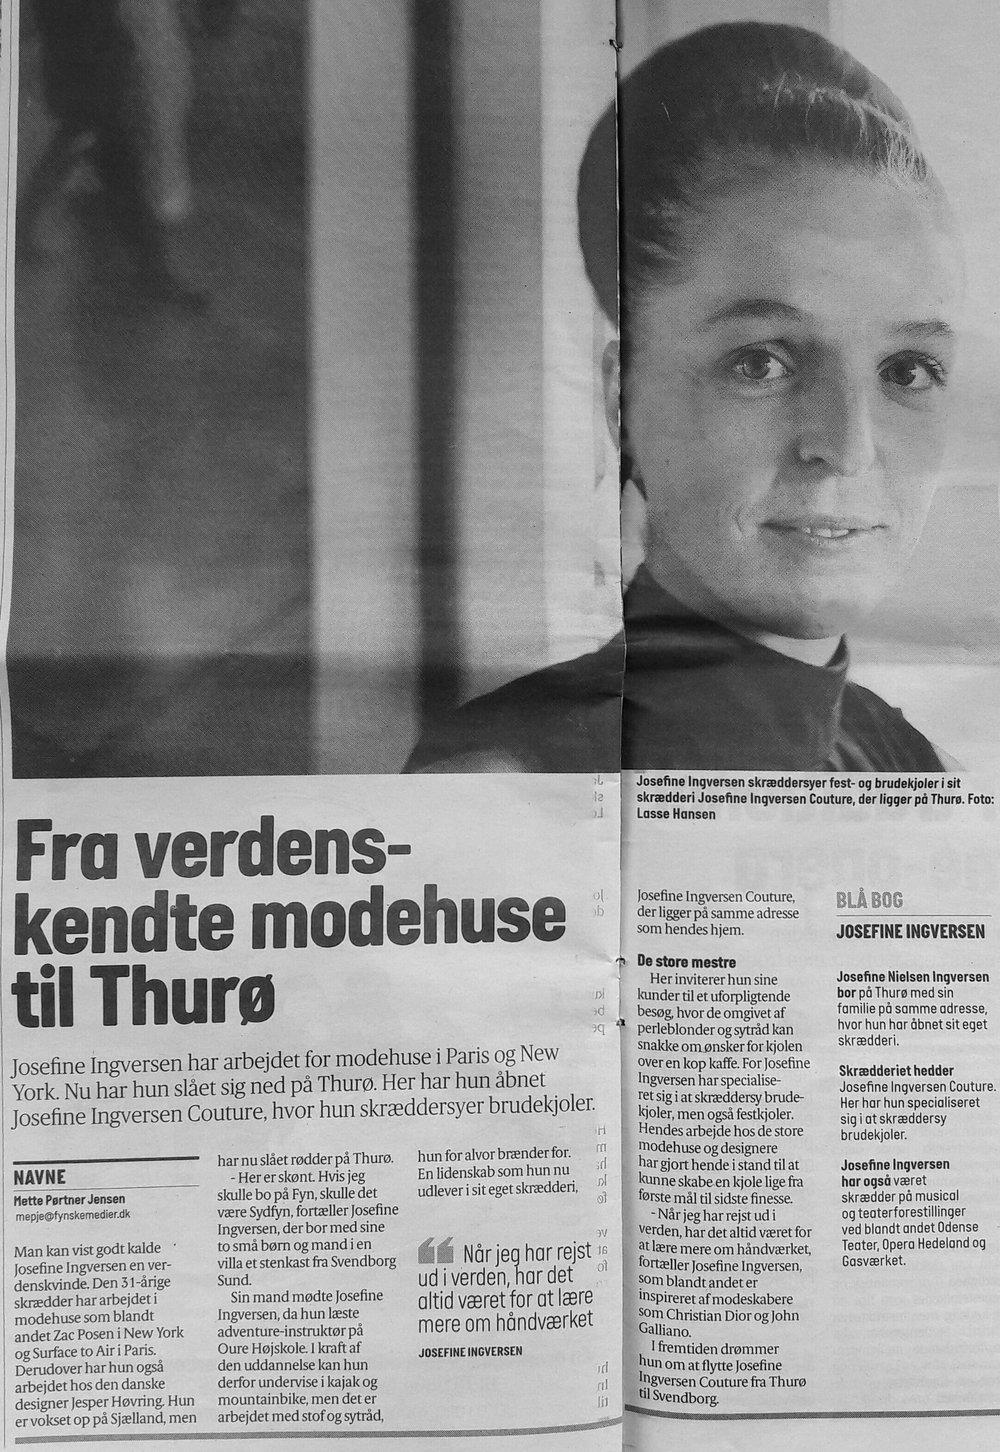 Navnlig // Fra Verdenskendte modehuse til Thurø // Fyens Stifttidende & Fyens Amts Avis // 26. februar 2017